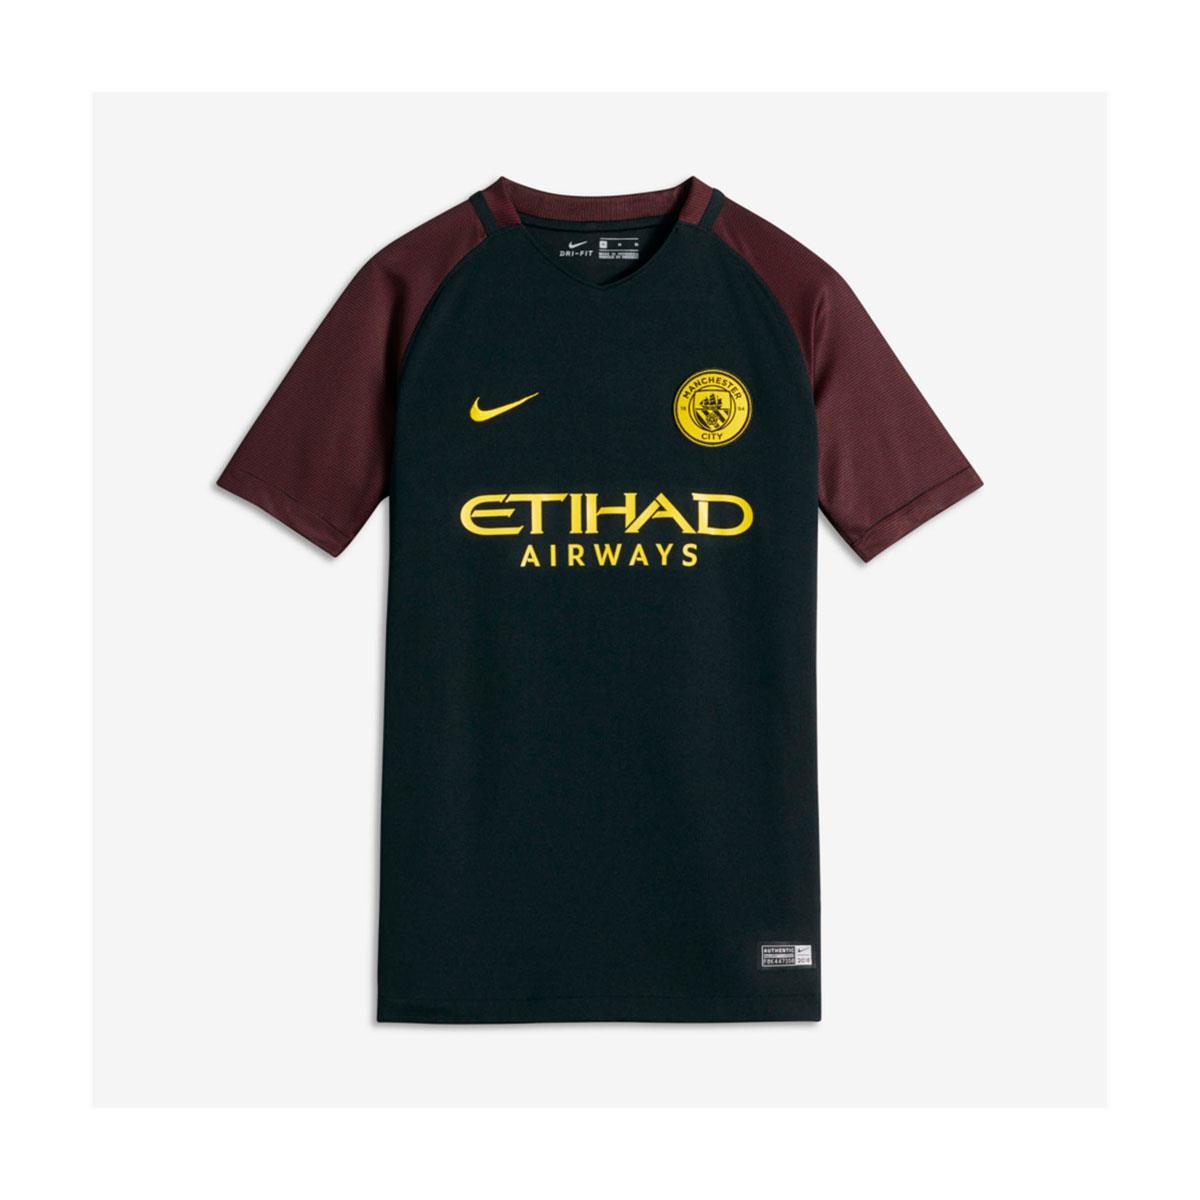 c97a3a1c4e250 Camisa Nike Manchester City II Torcedor Infantil 2016 2017